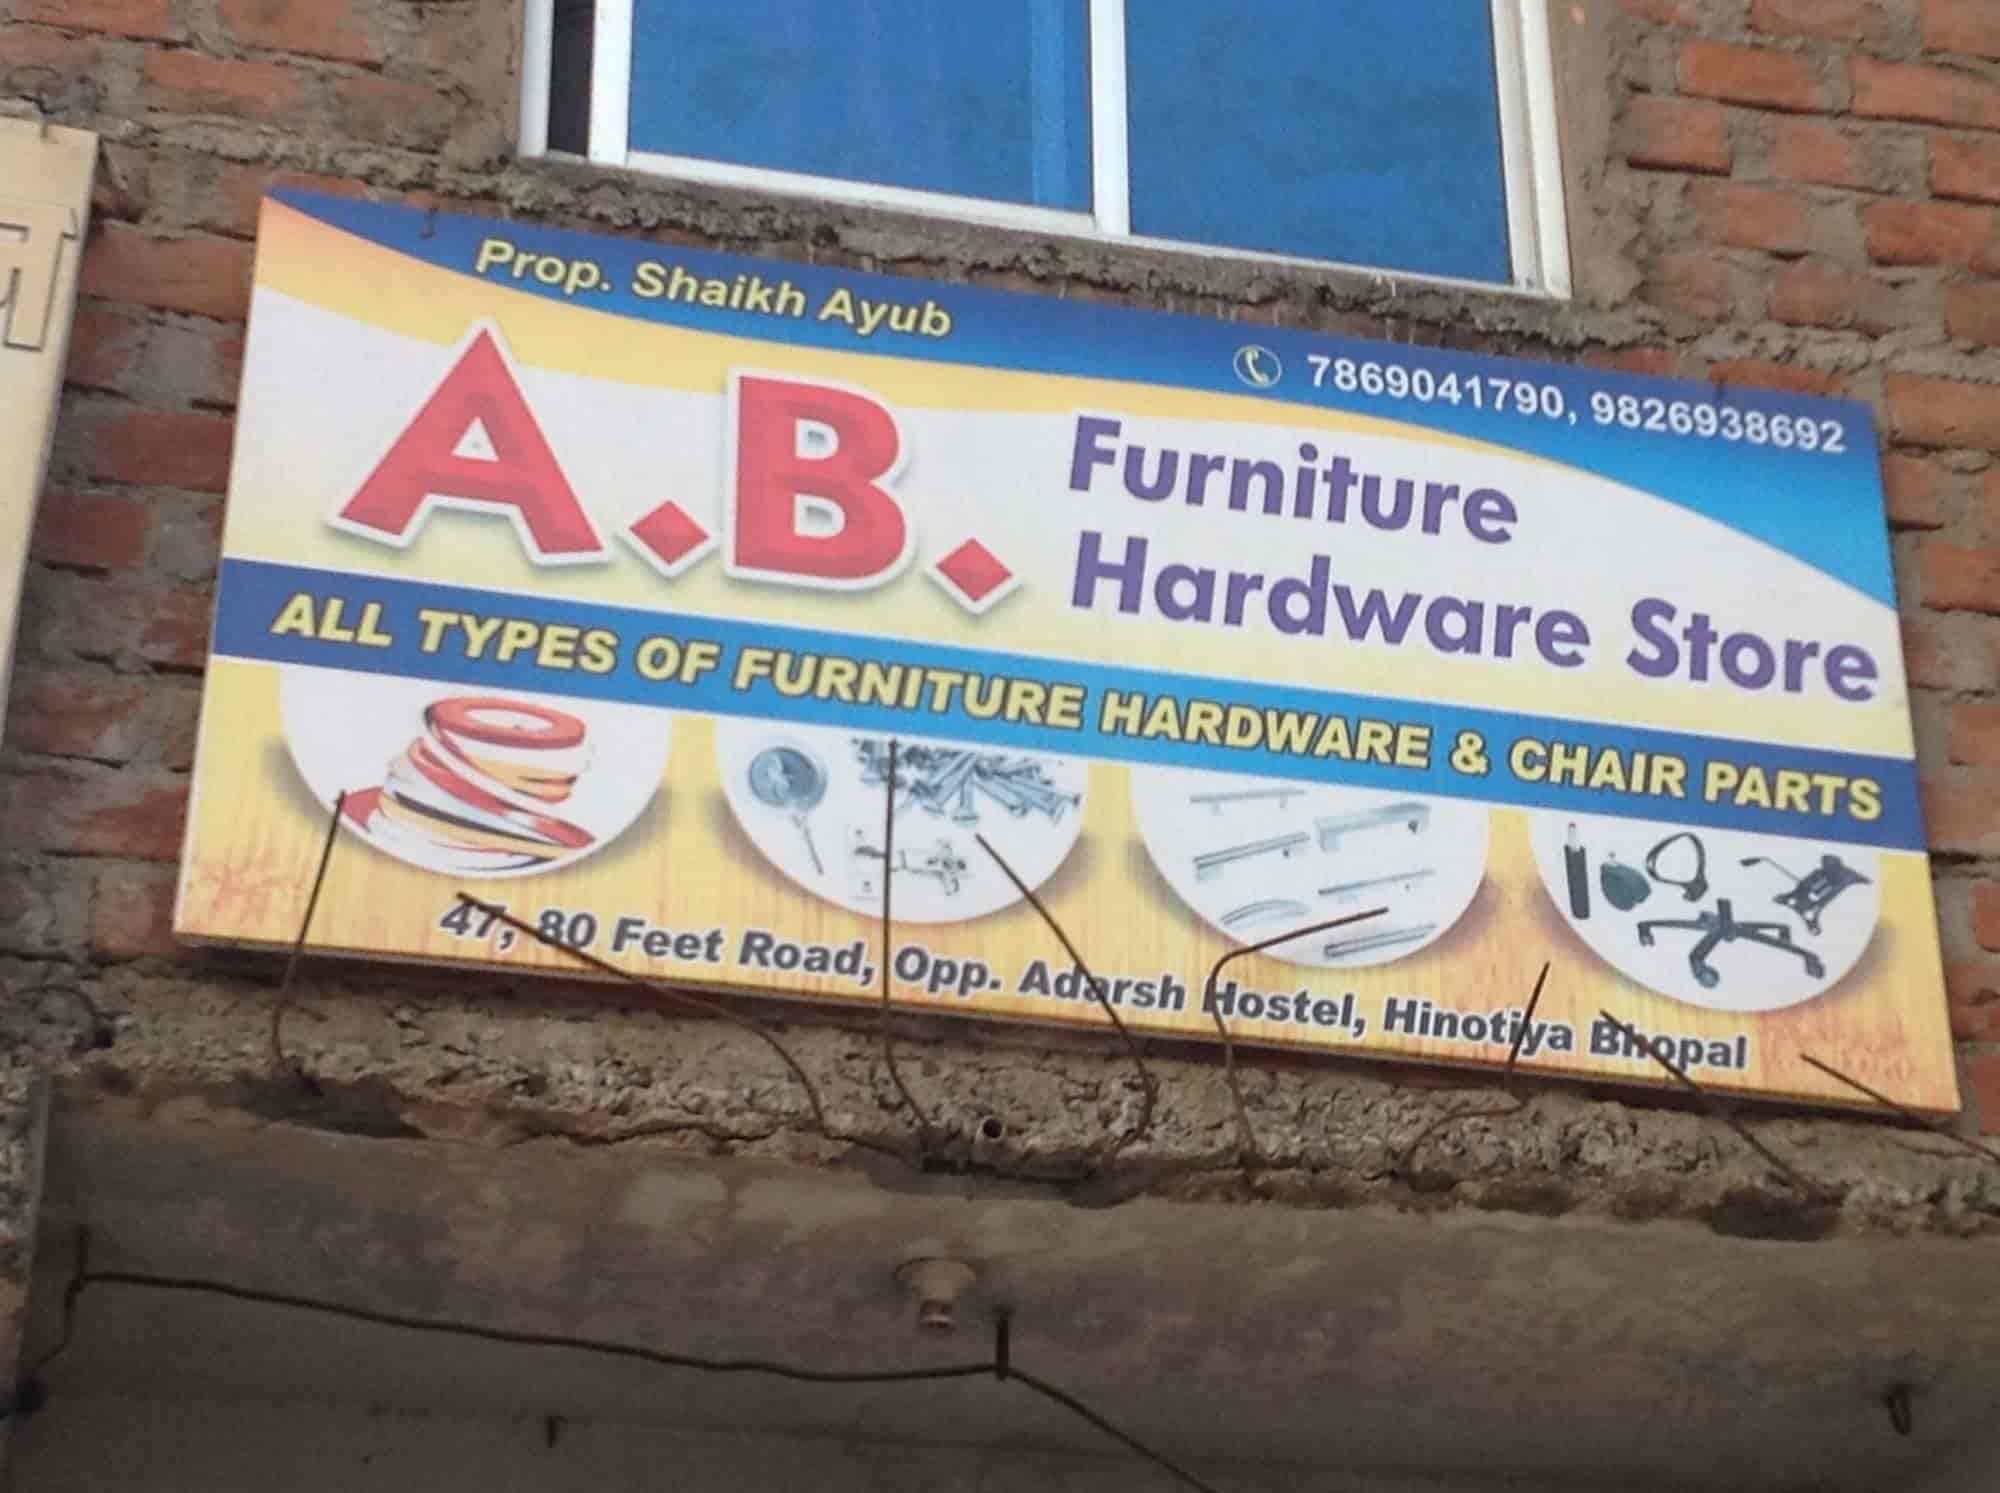 A B Furniture Hardware Store